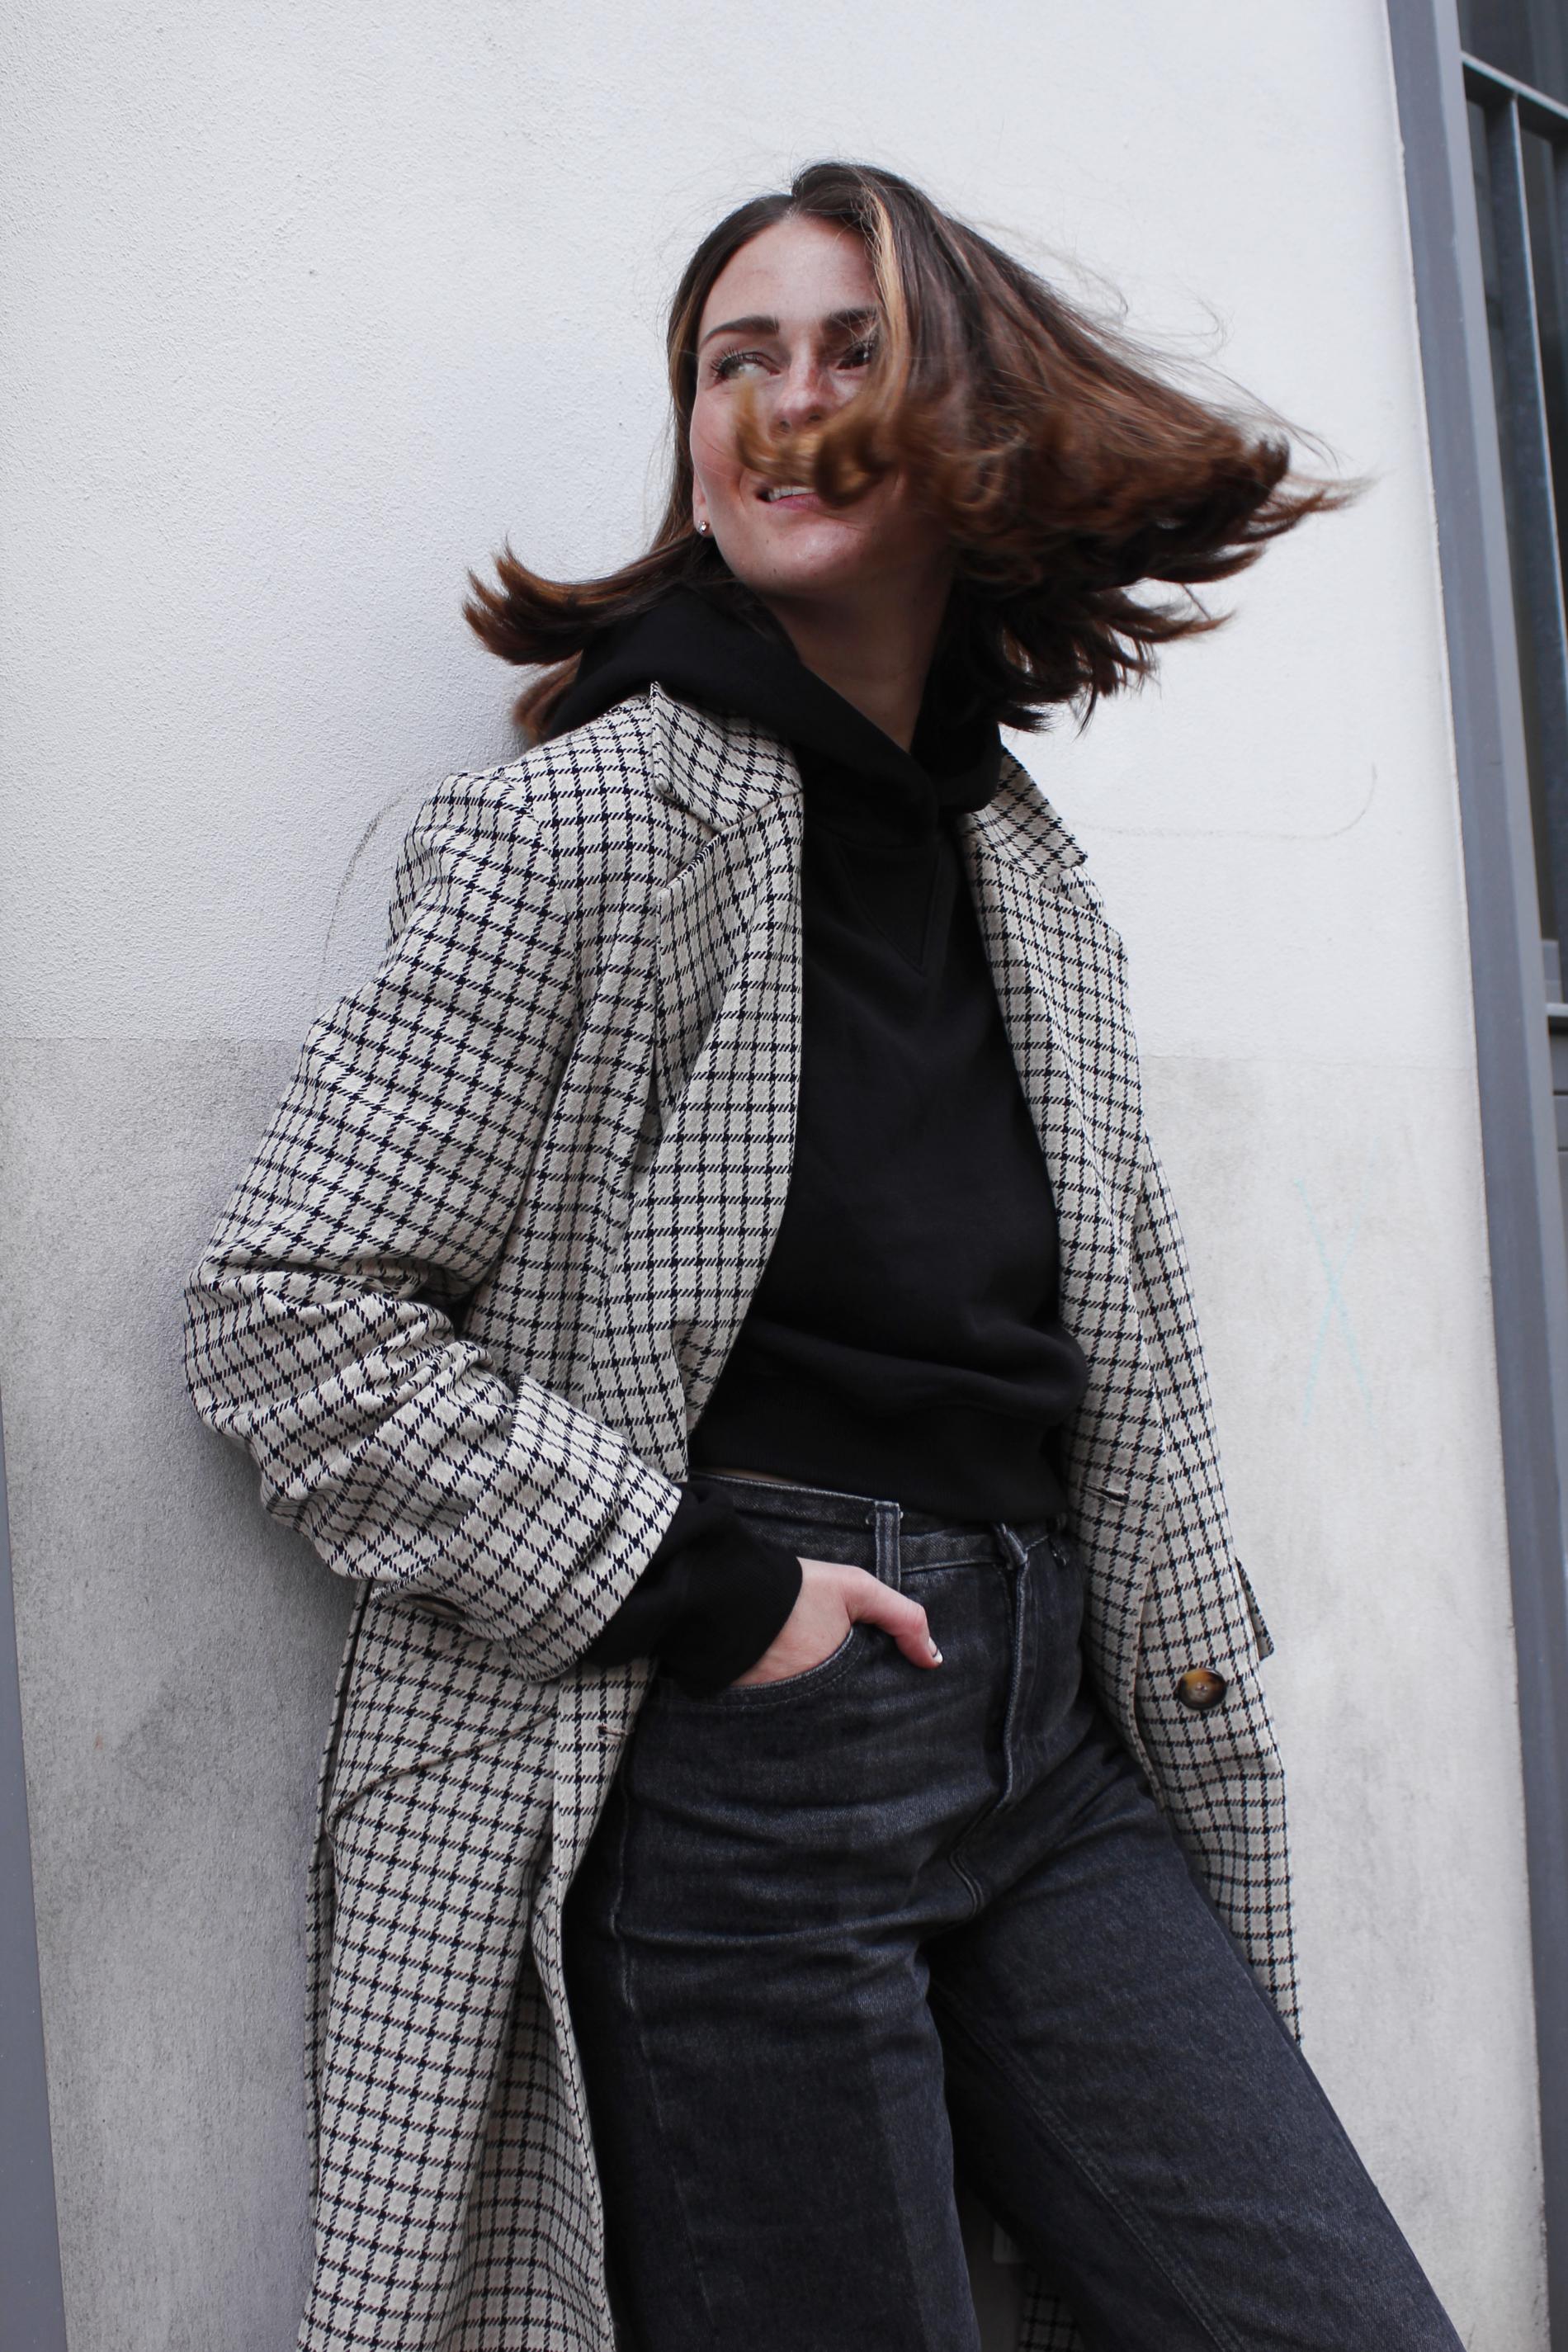 annaporter-checked-coat-hm-fashionblogger-portrait-2.jpg